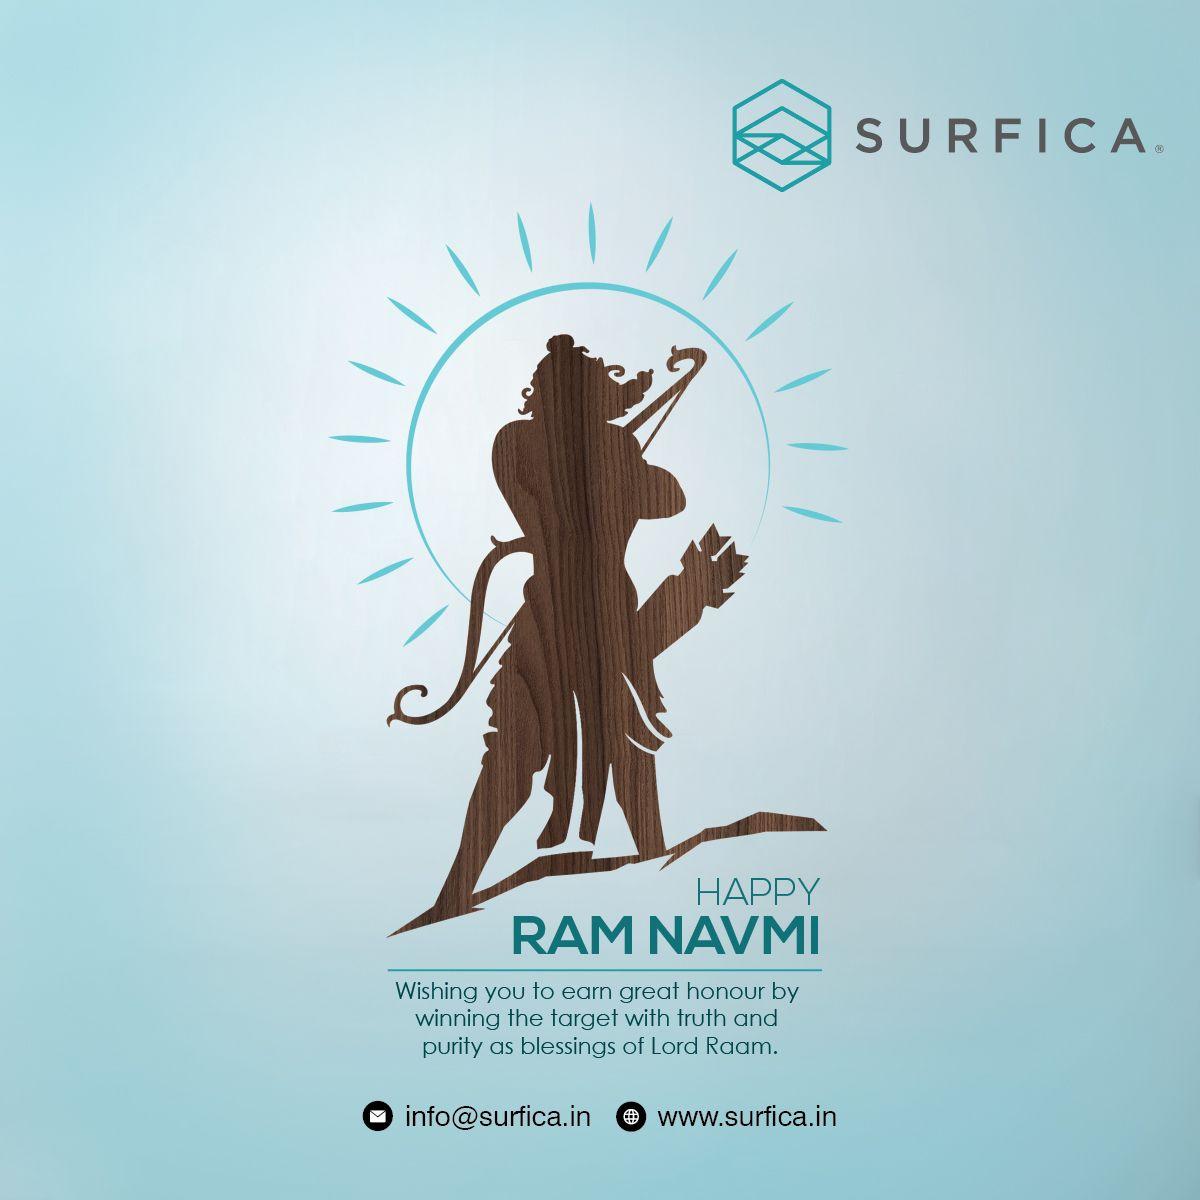 Luxury Interiordesign: Happy Ram Navami Wishing You To Earn Great Honour By